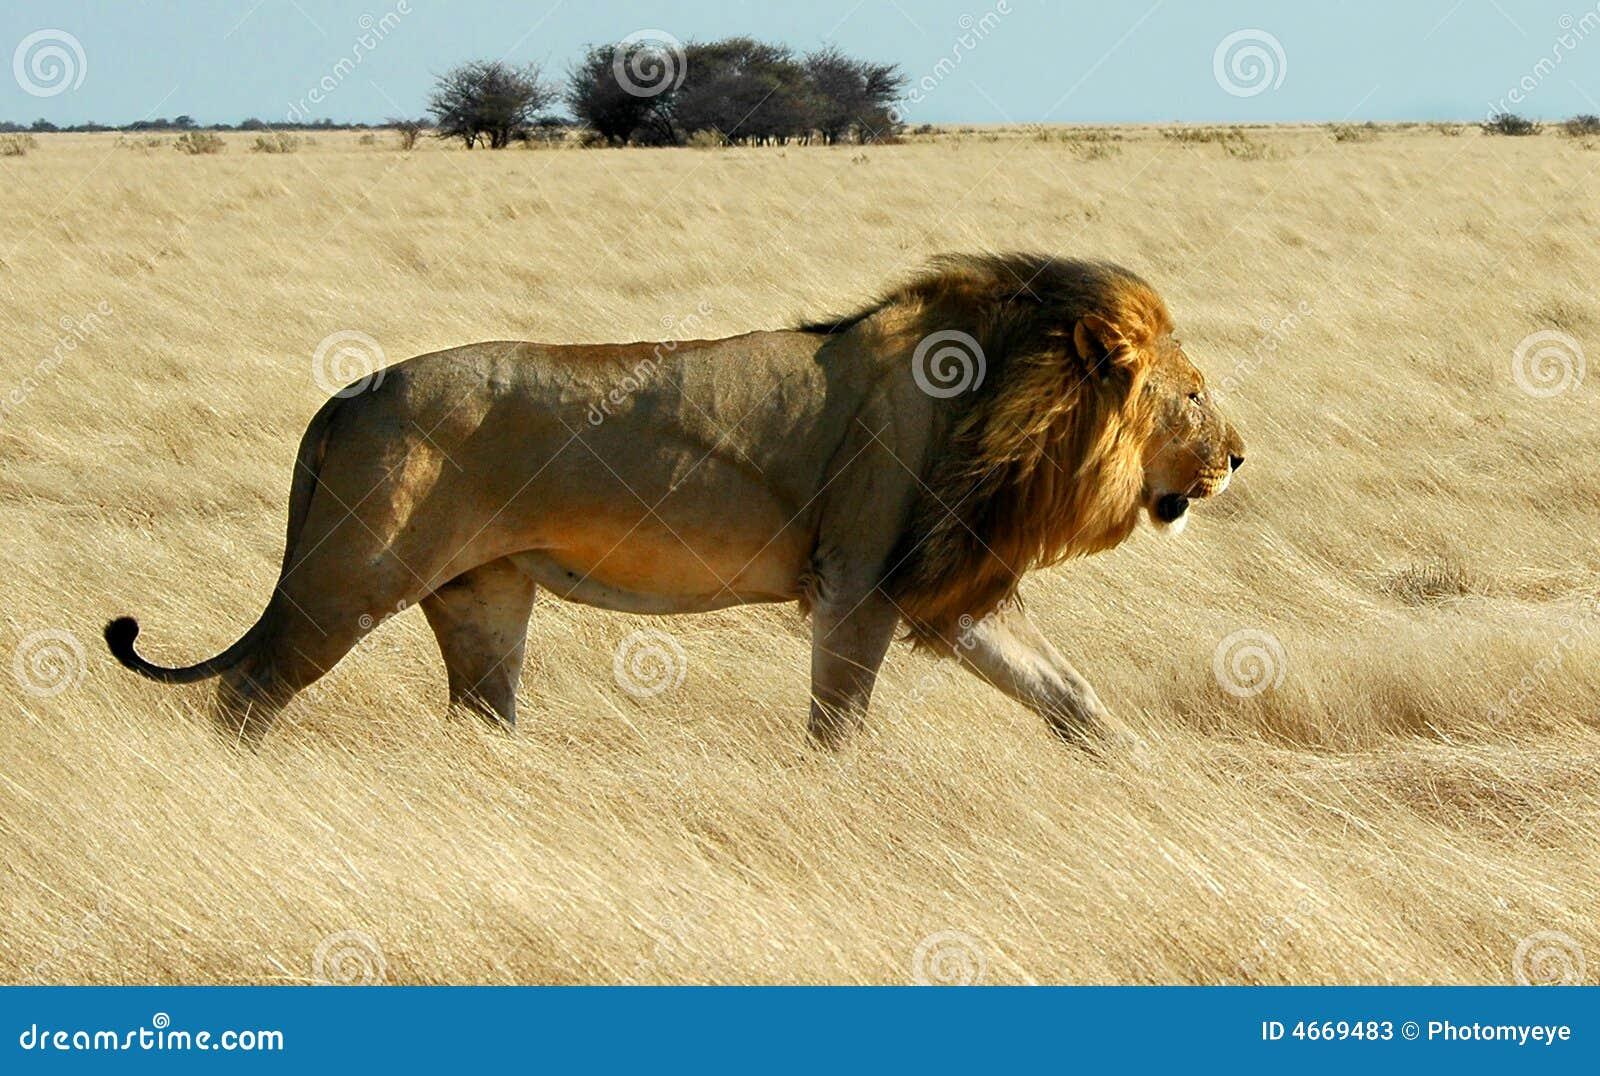 lion walking stock image image of grace outdoor graceful 4669483